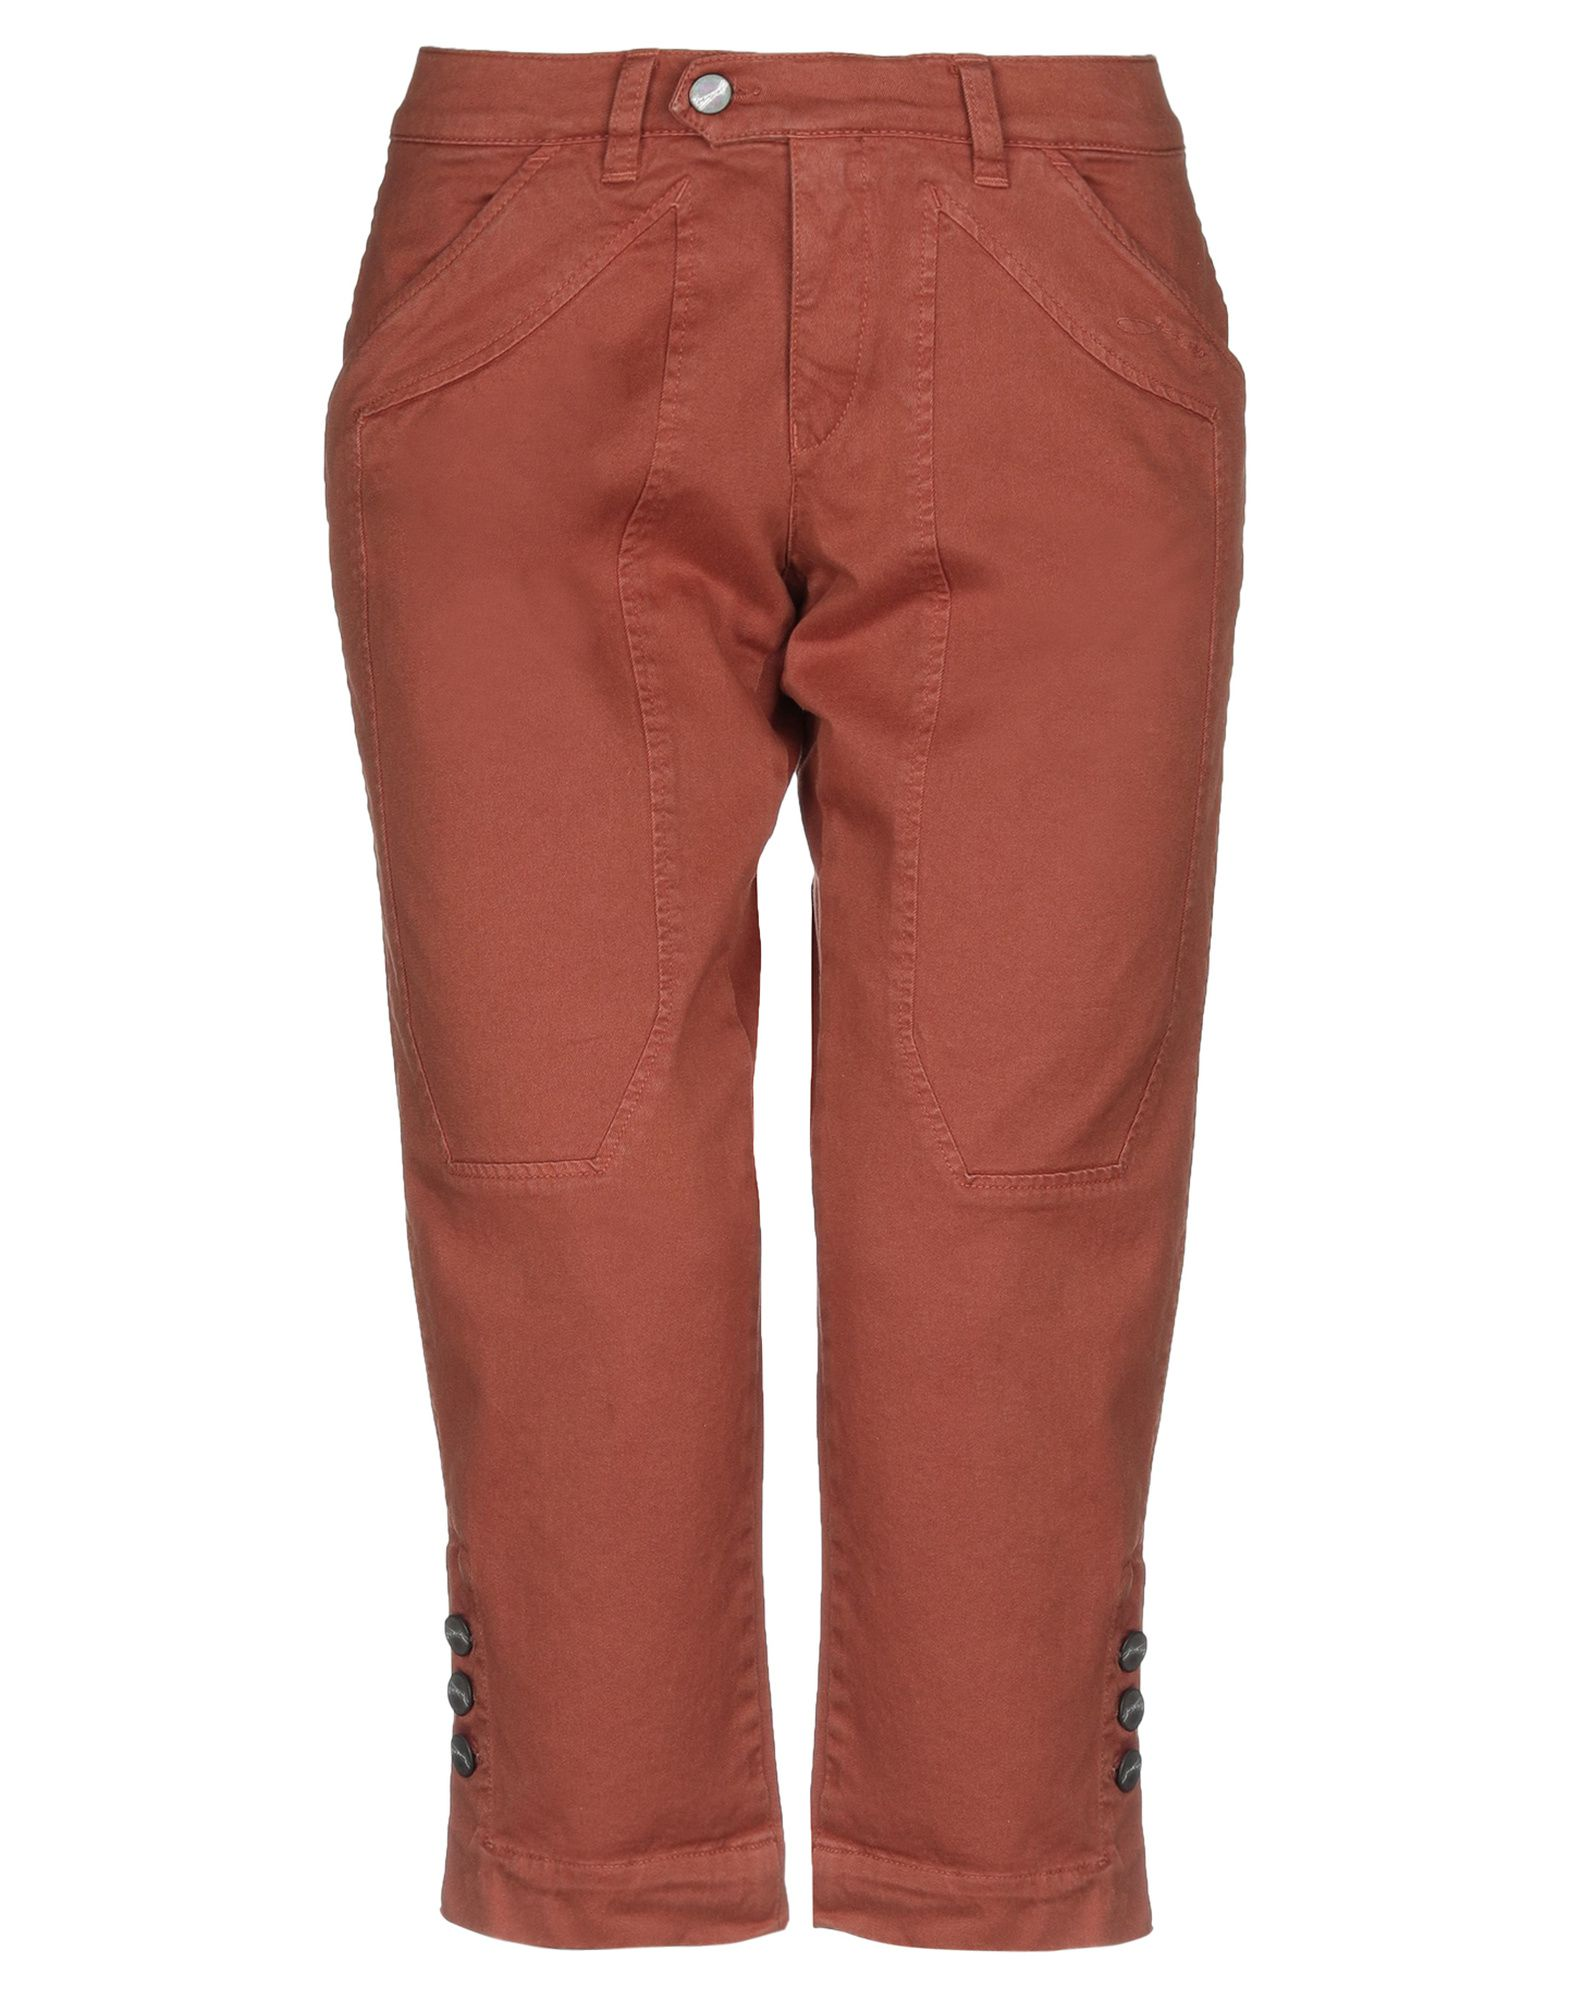 JECKERSON Джинсовые брюки-капри цена 2017